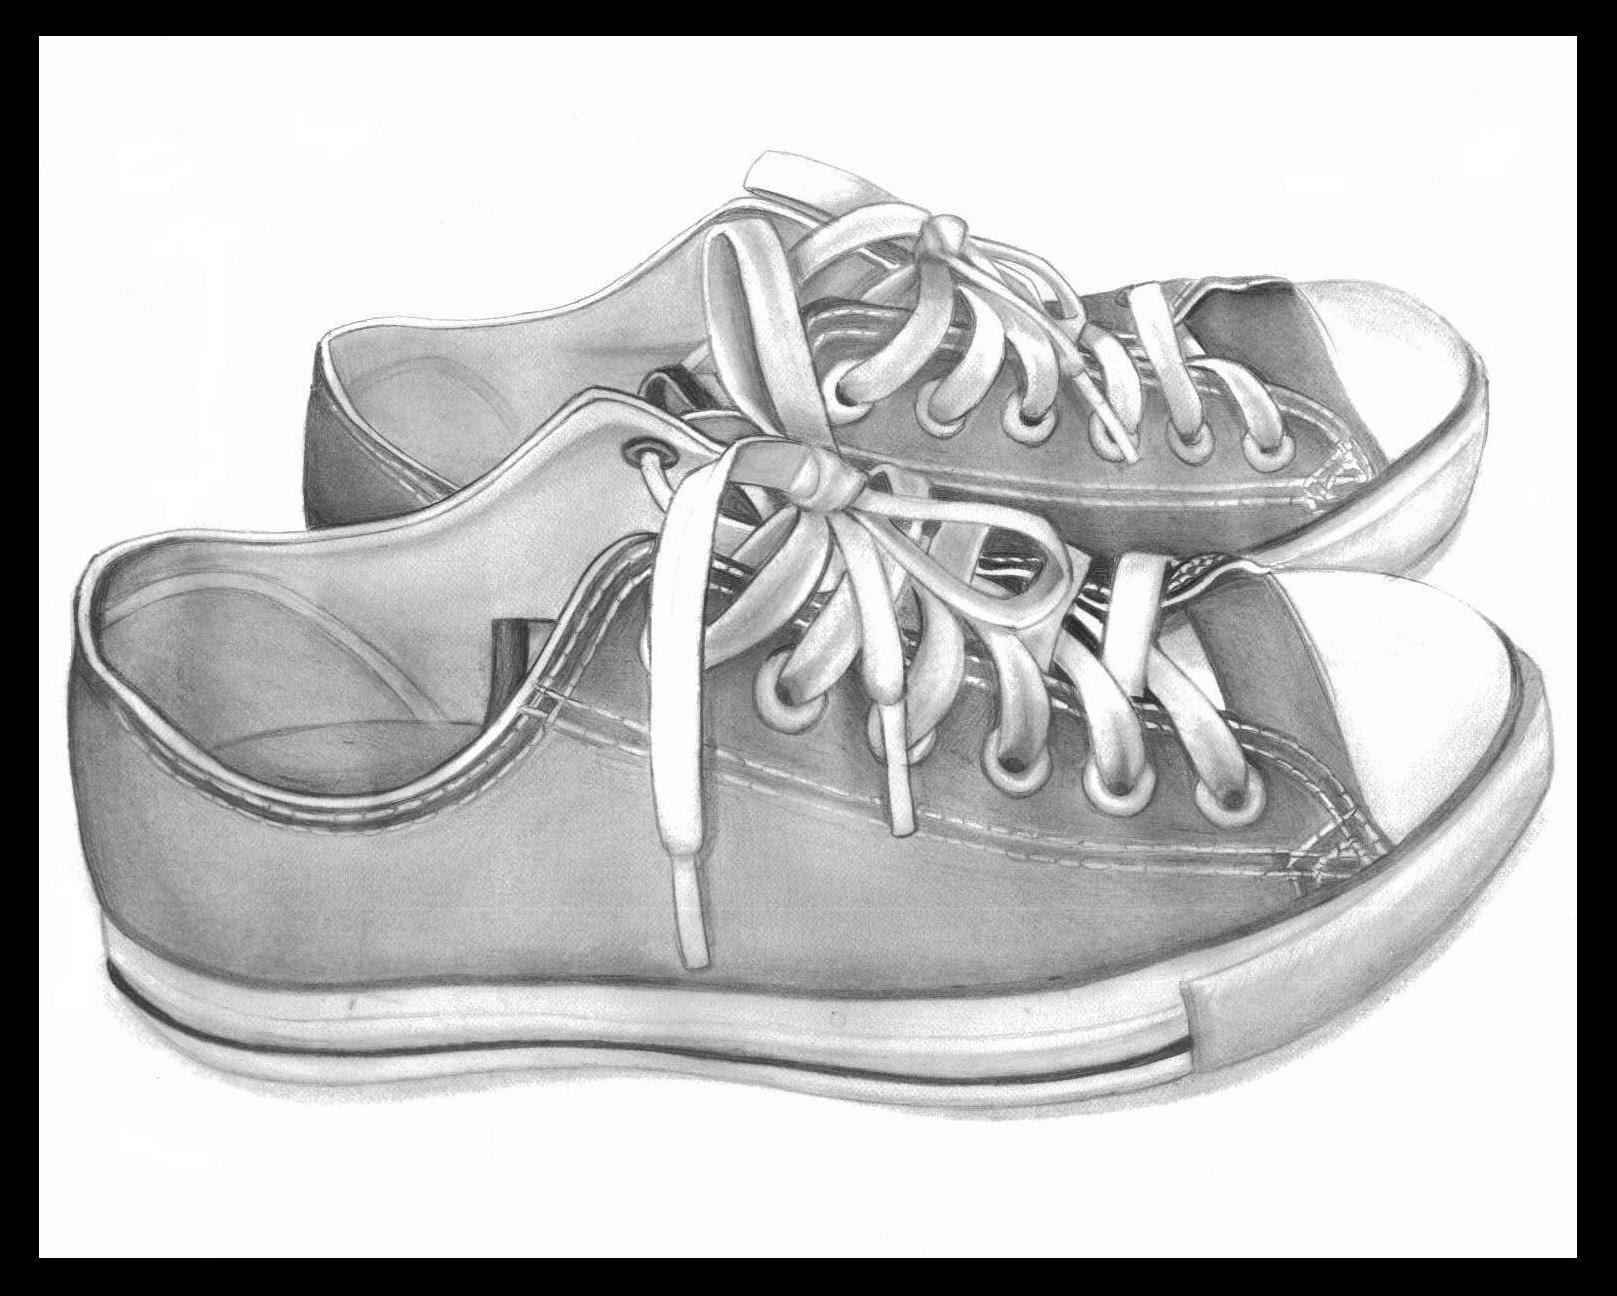 Drawn shoe doodle Drawing Pencil 3d Realistic